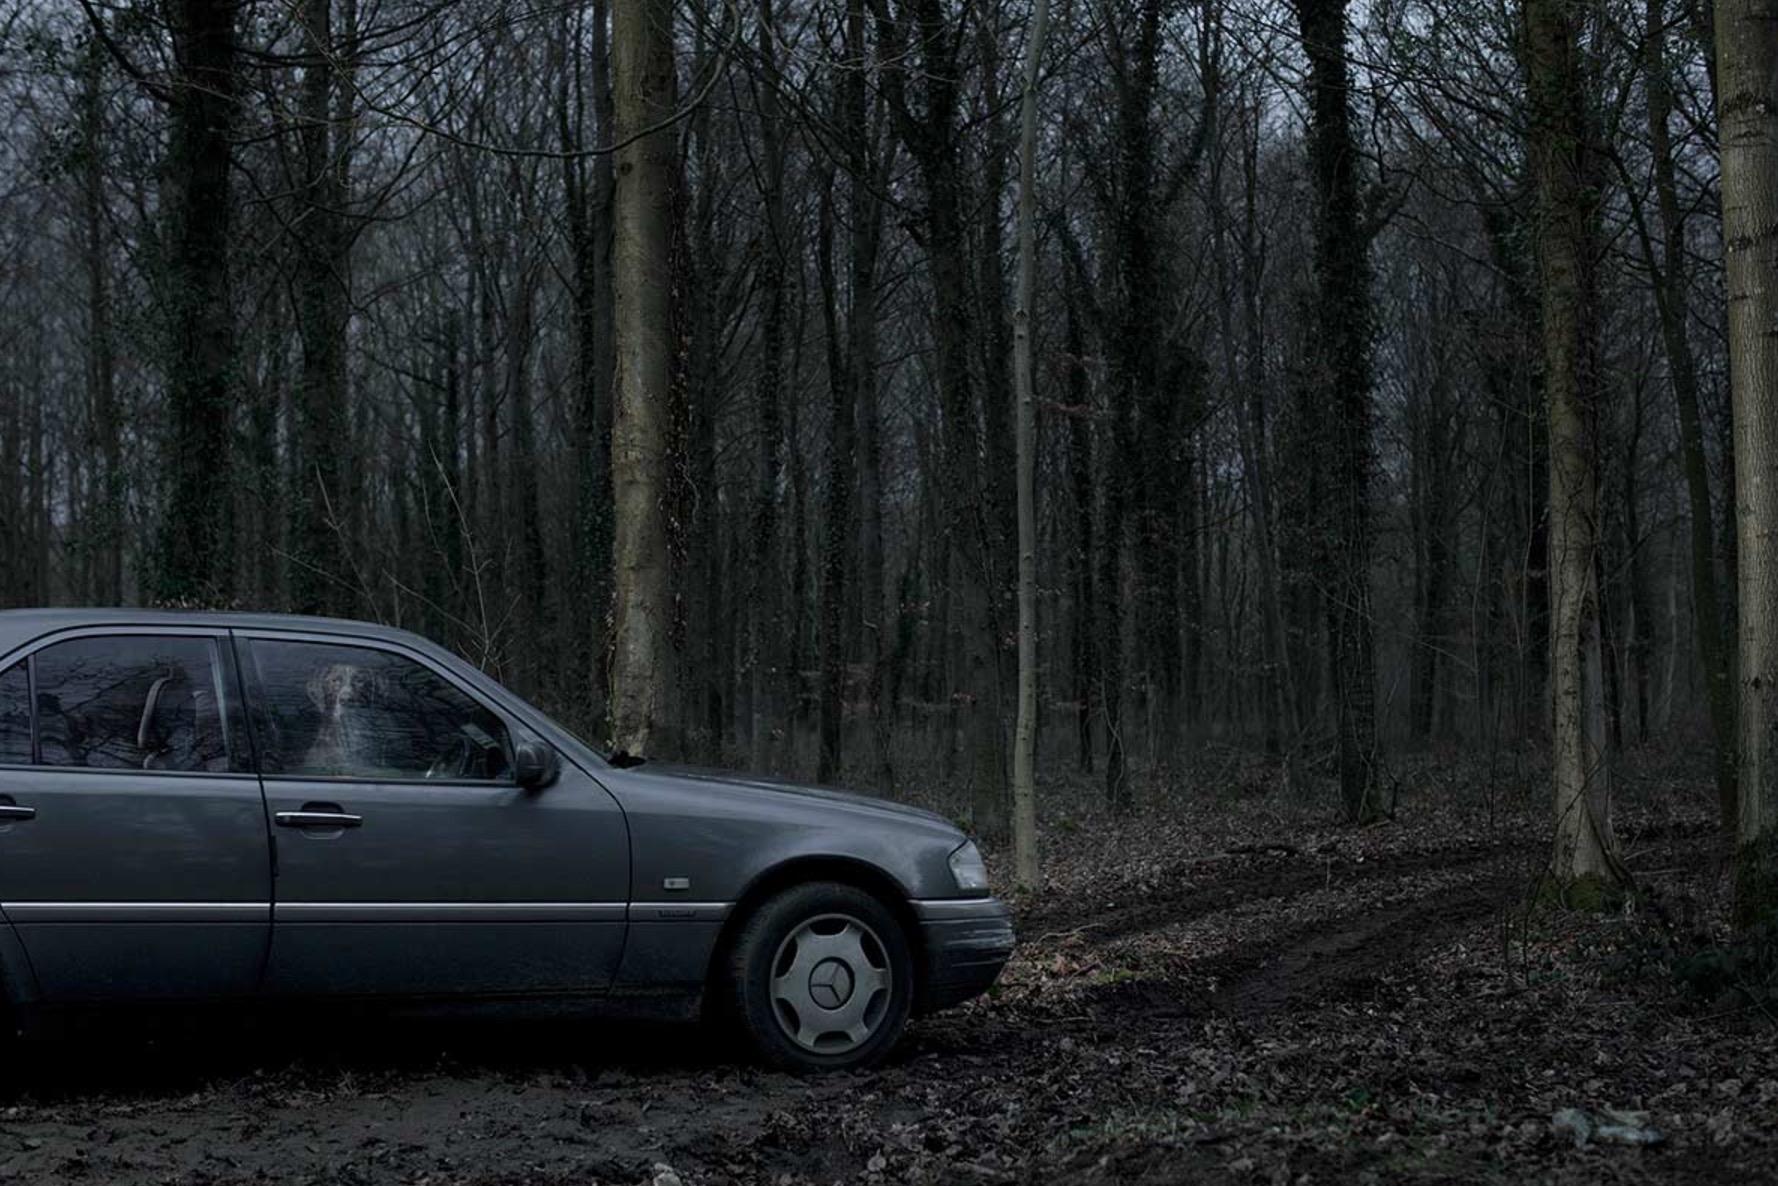 Martin-Usborne-photographe-chiens-voitures-1